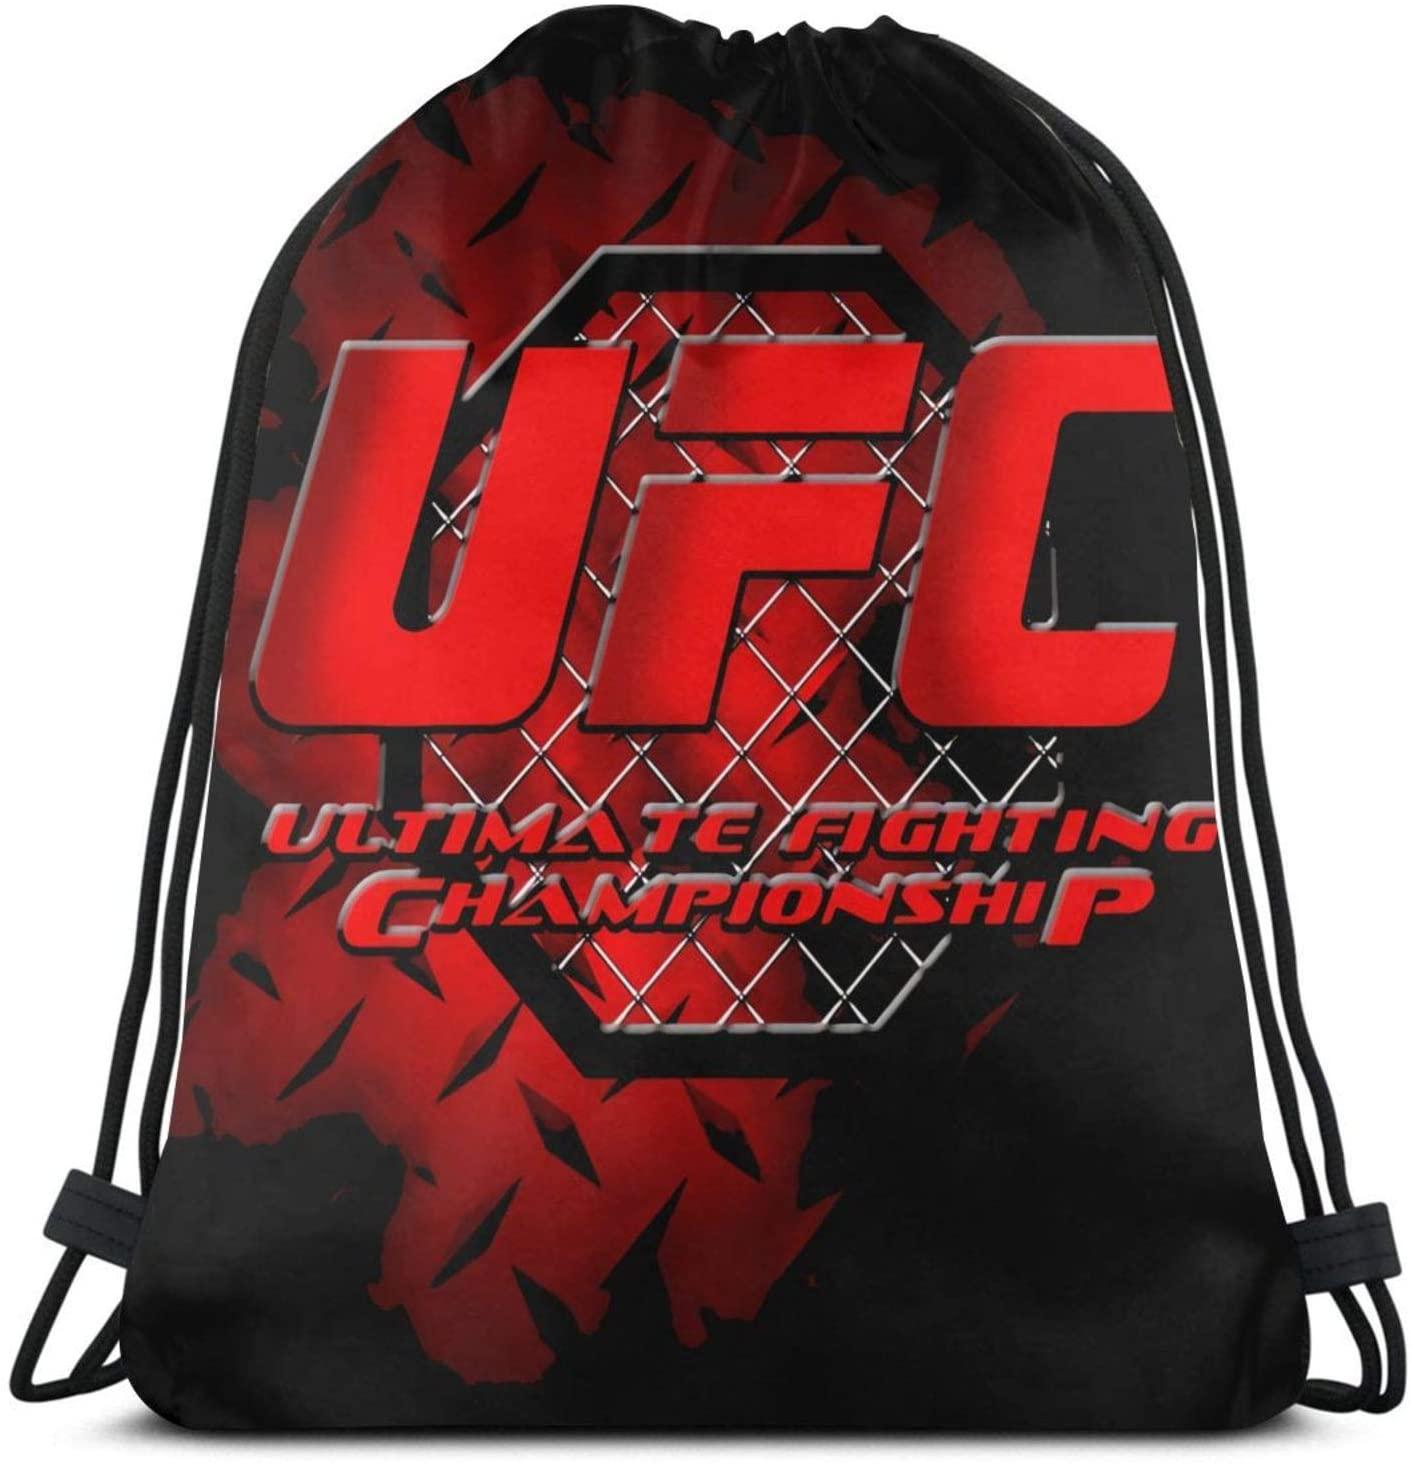 Sonickingmall Ultimate Fighting Championship Drawstring Bags Gym Bag